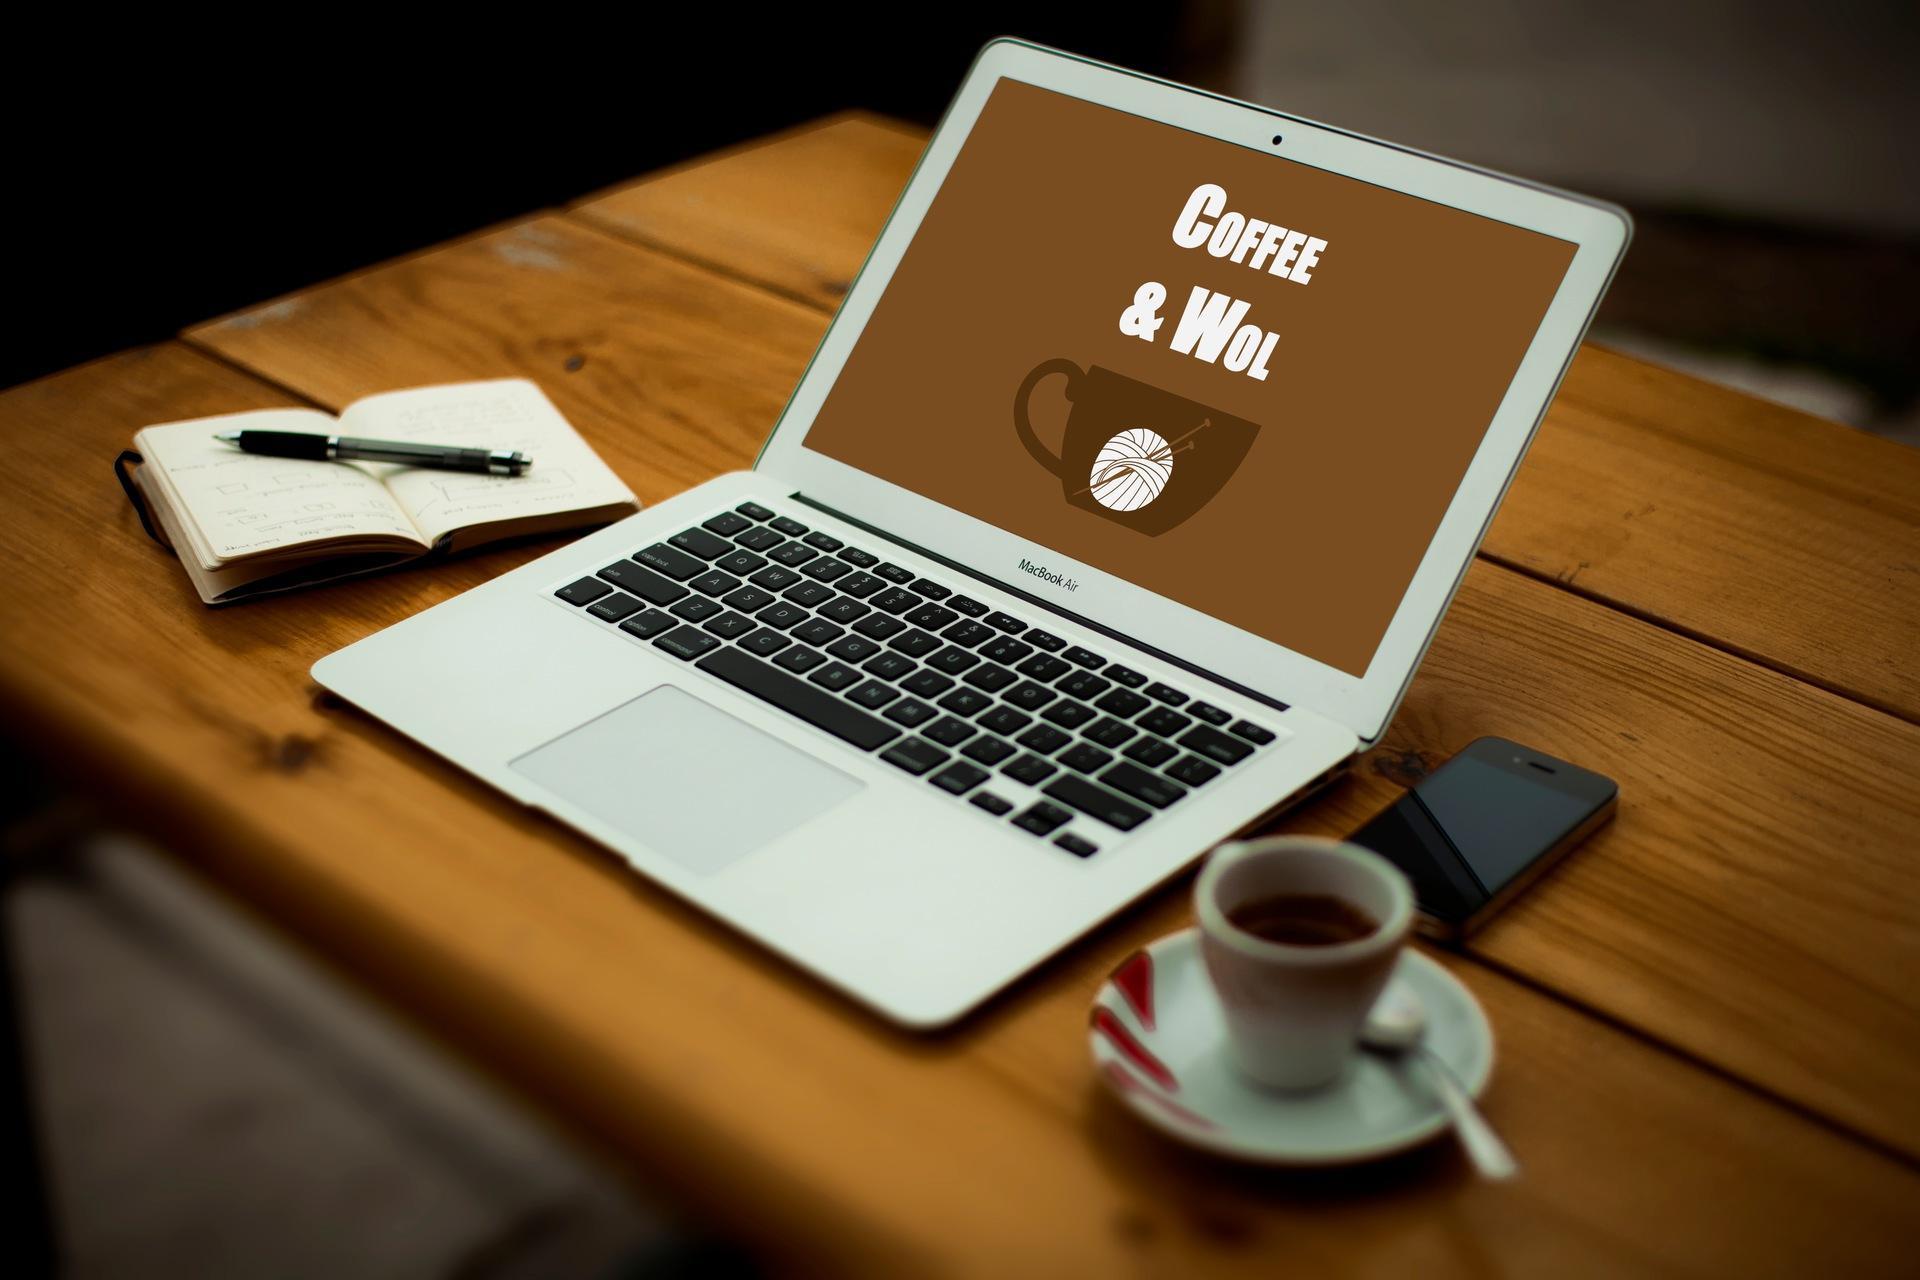 Coffee & Wol